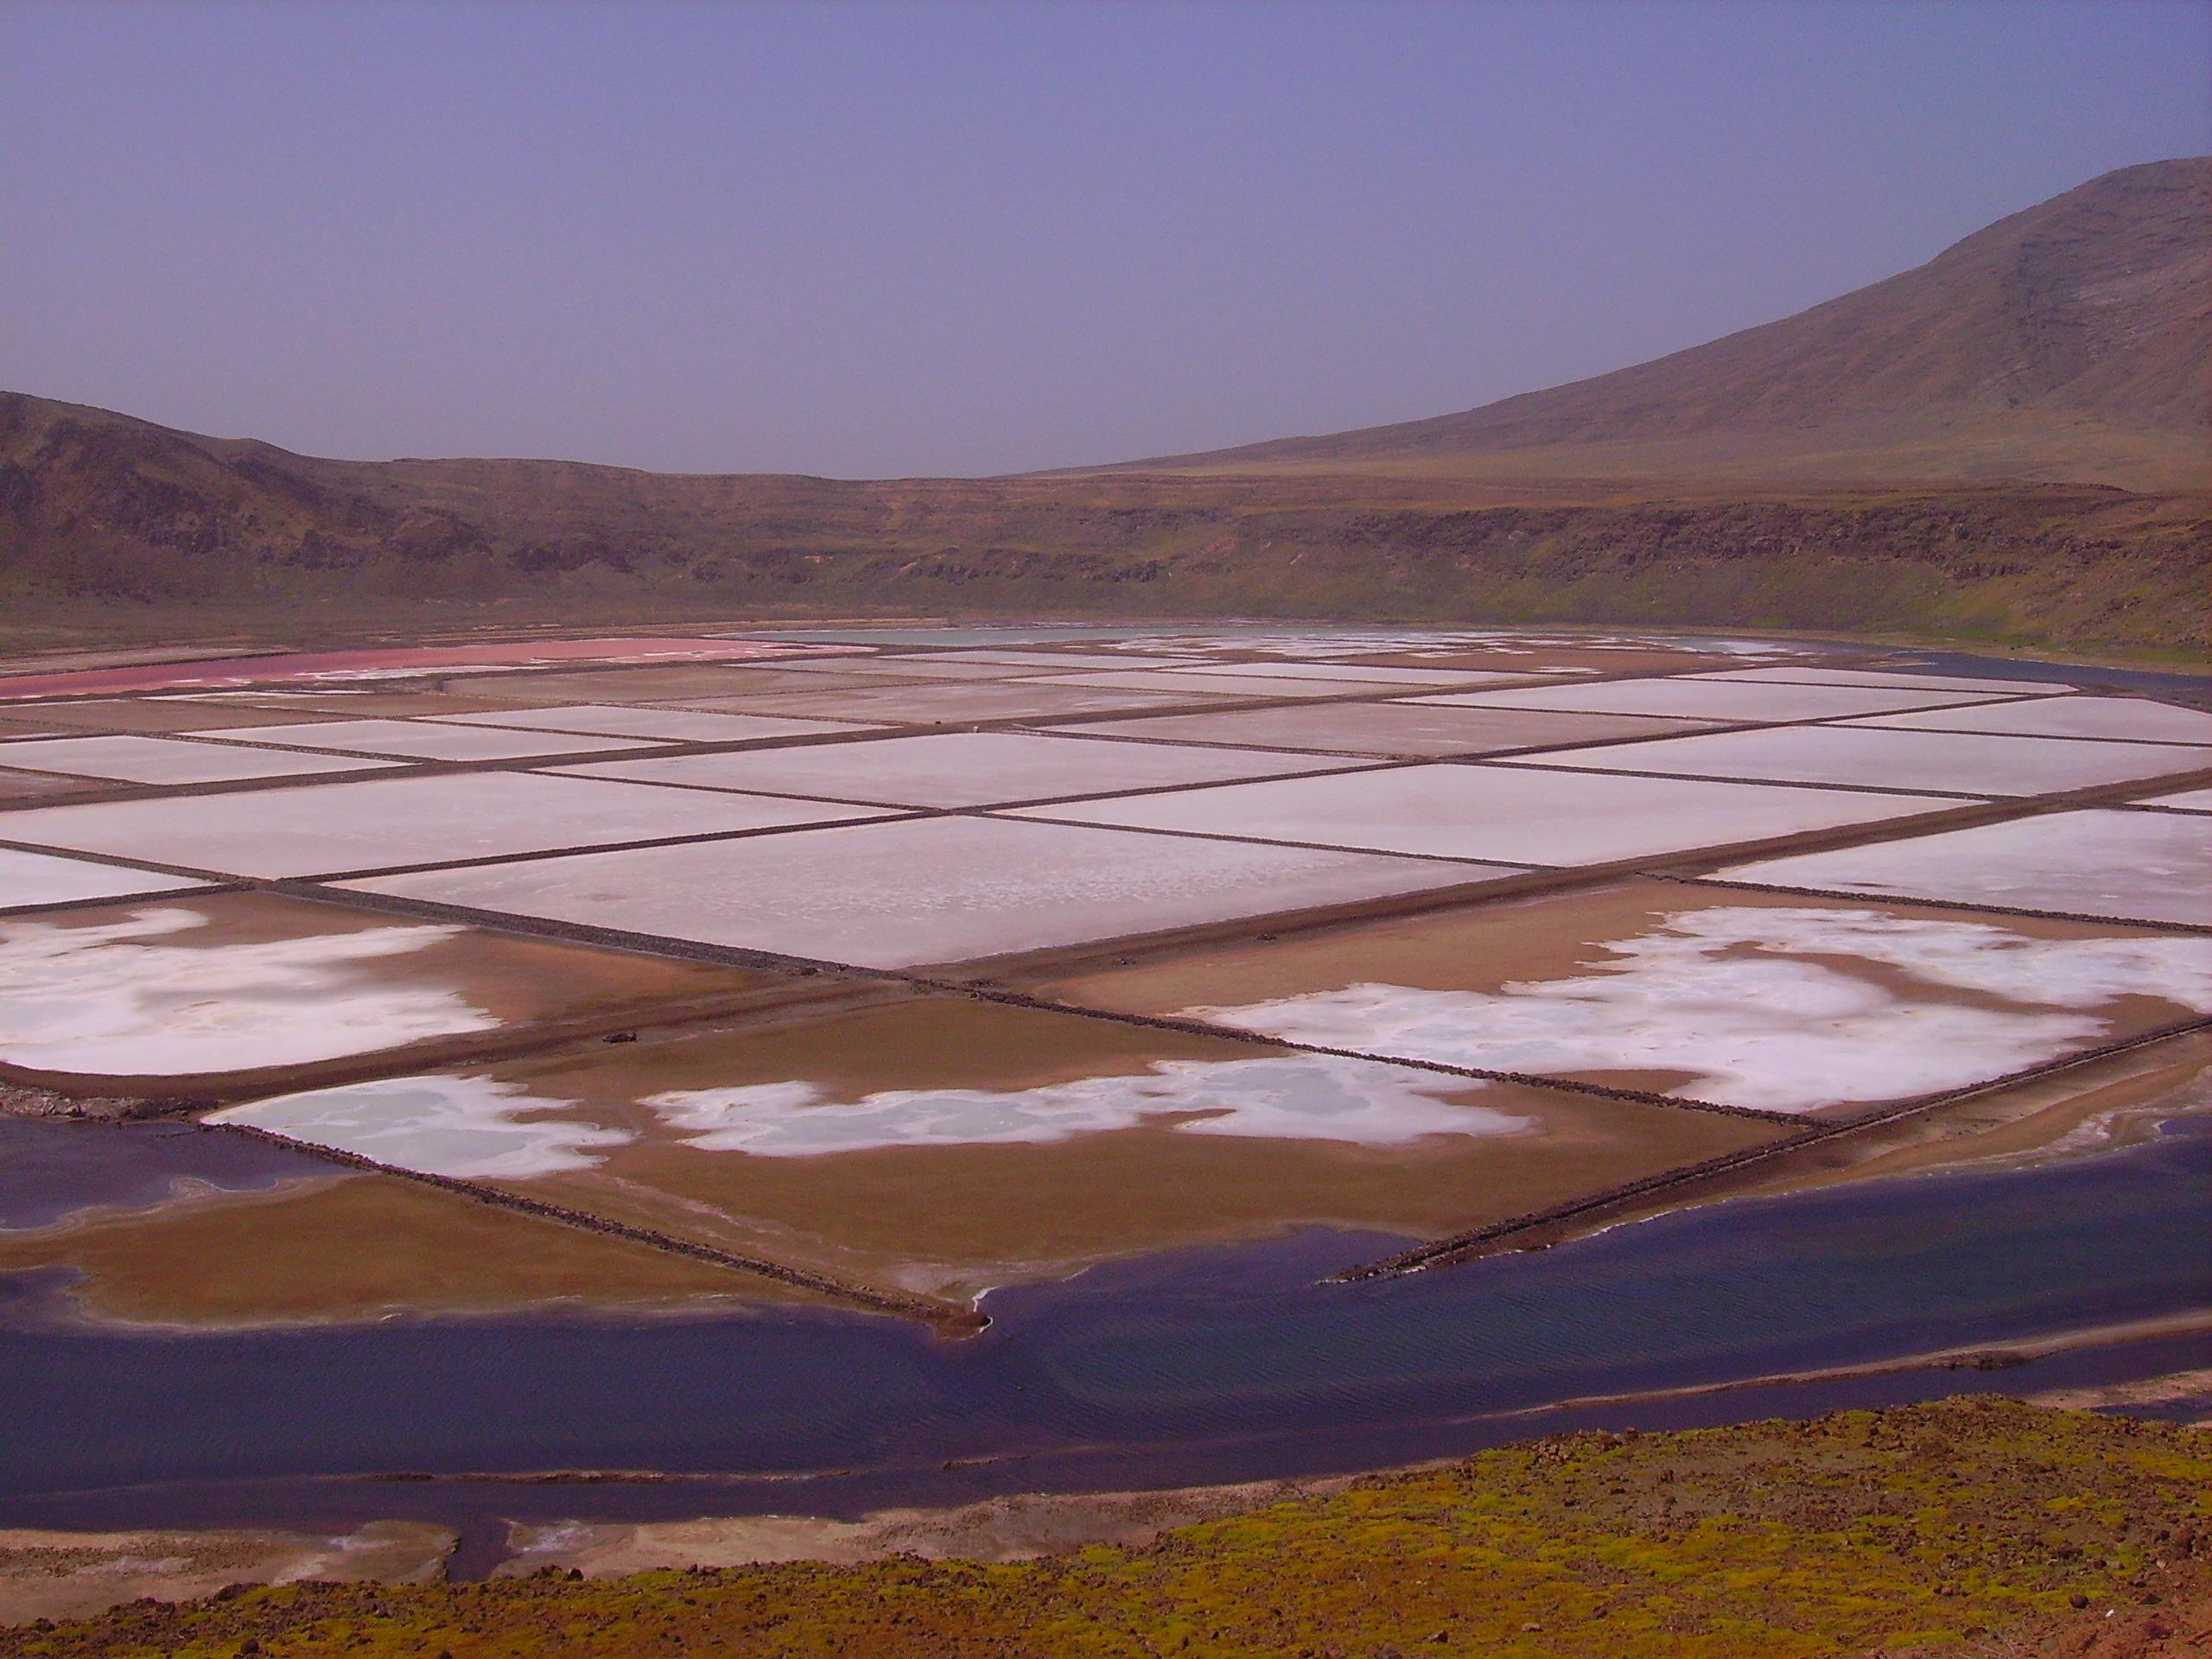 [cml_media_alt id='5170']Le saline - Isola di Sal - Capo Verde - Credits Nico[/cml_media_alt]